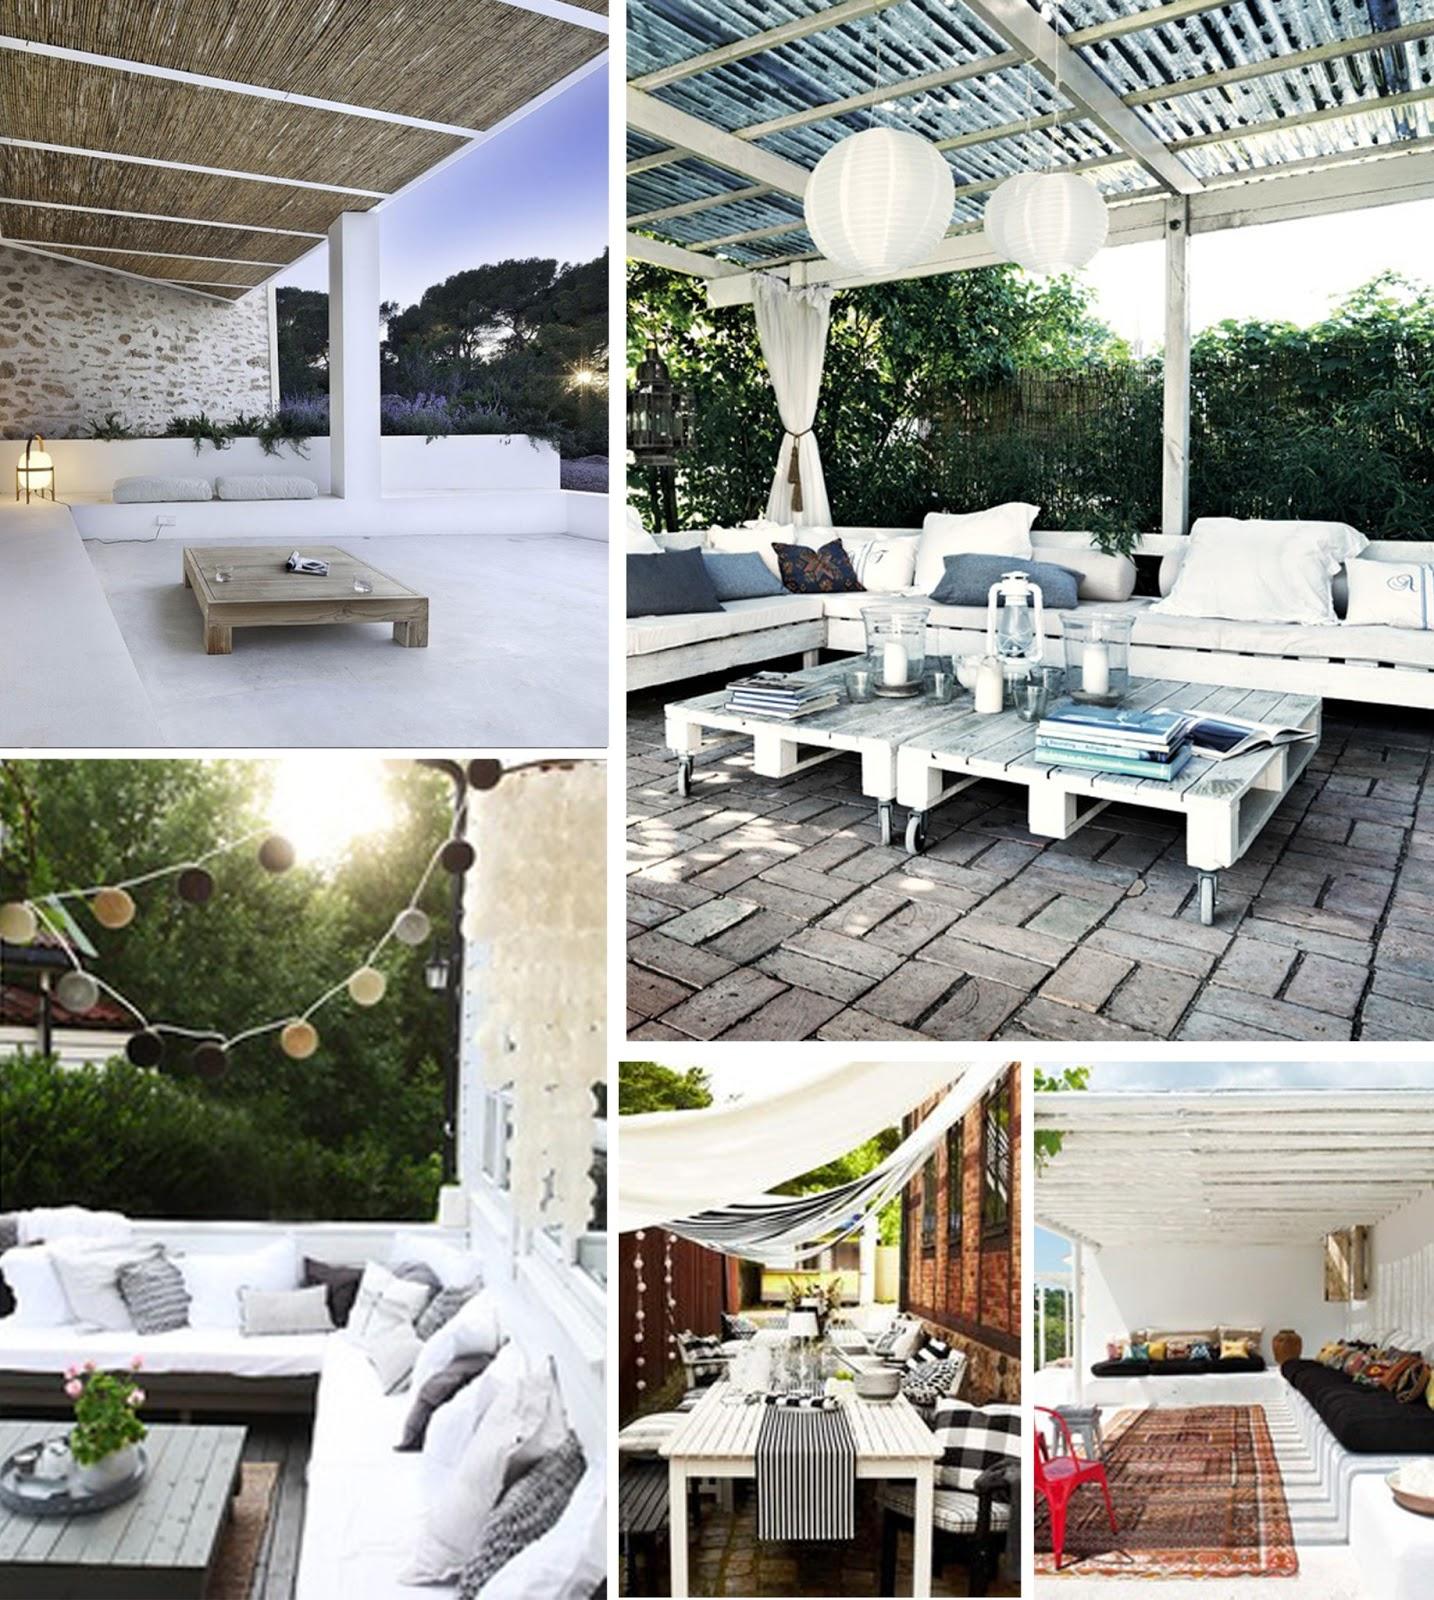 jardines y terrazas decoración homepersonalshoppper terrace, outdoor,